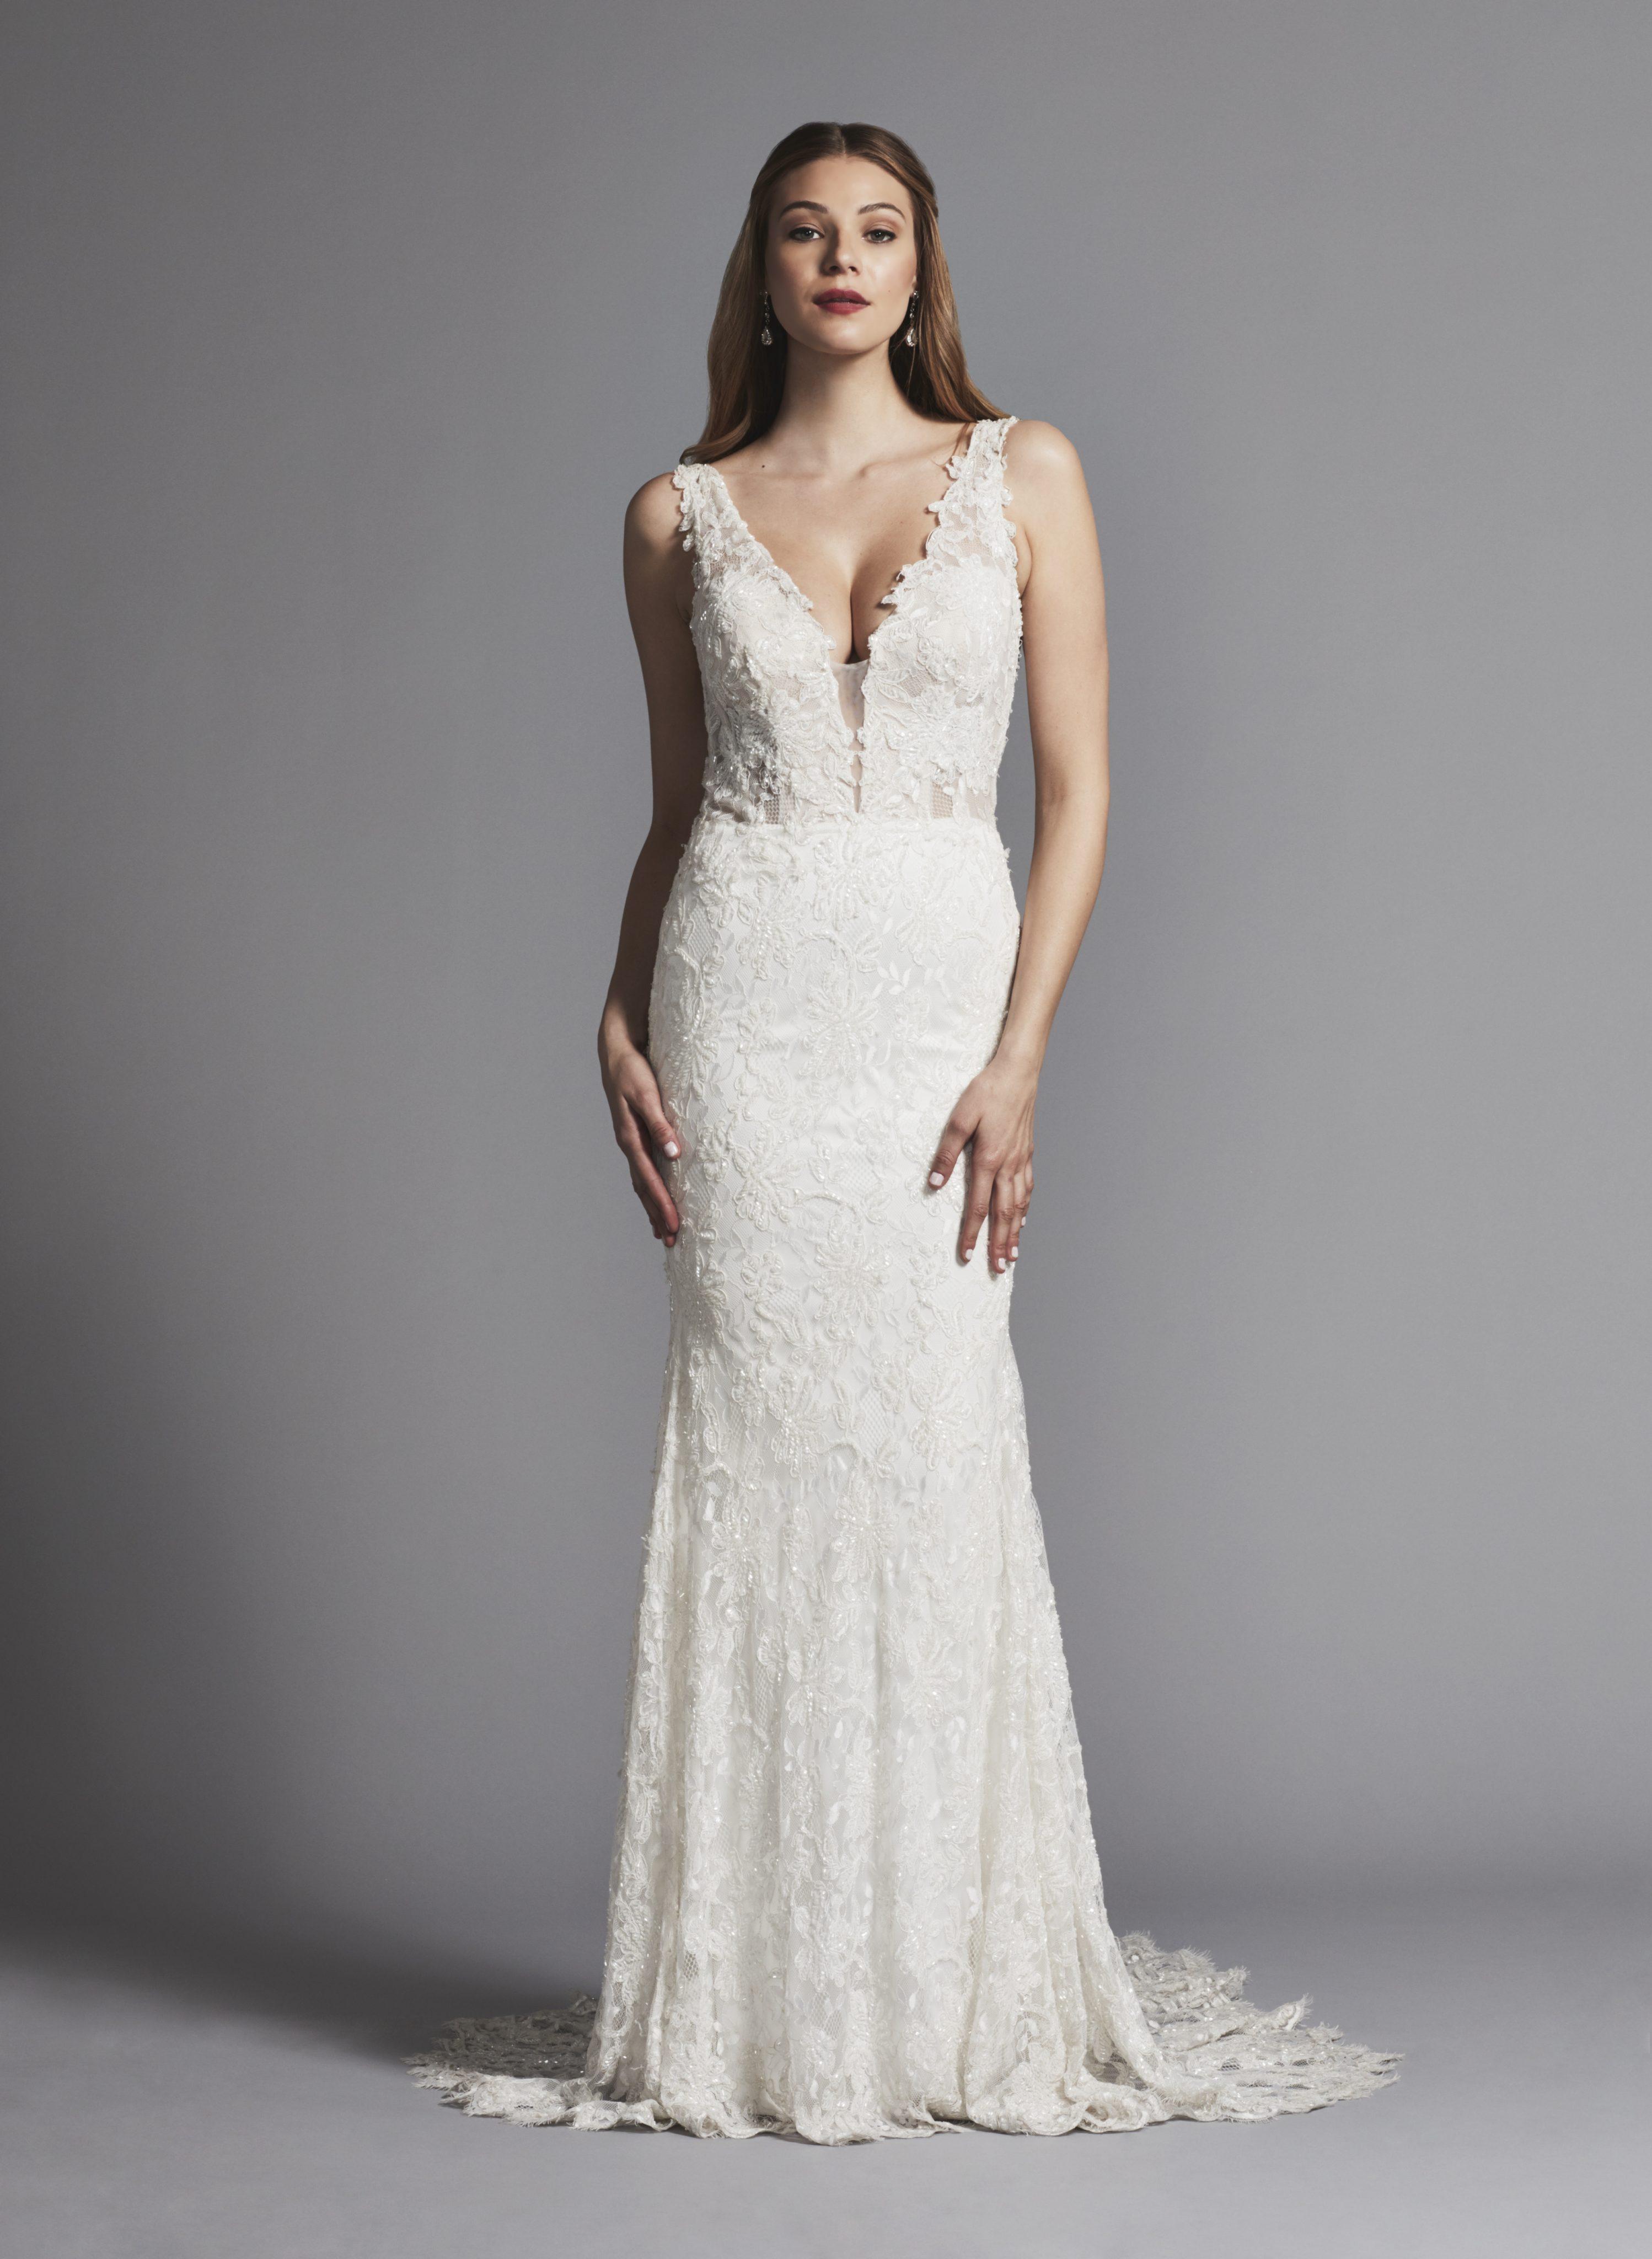 Israeli Wedding Dress Designer London